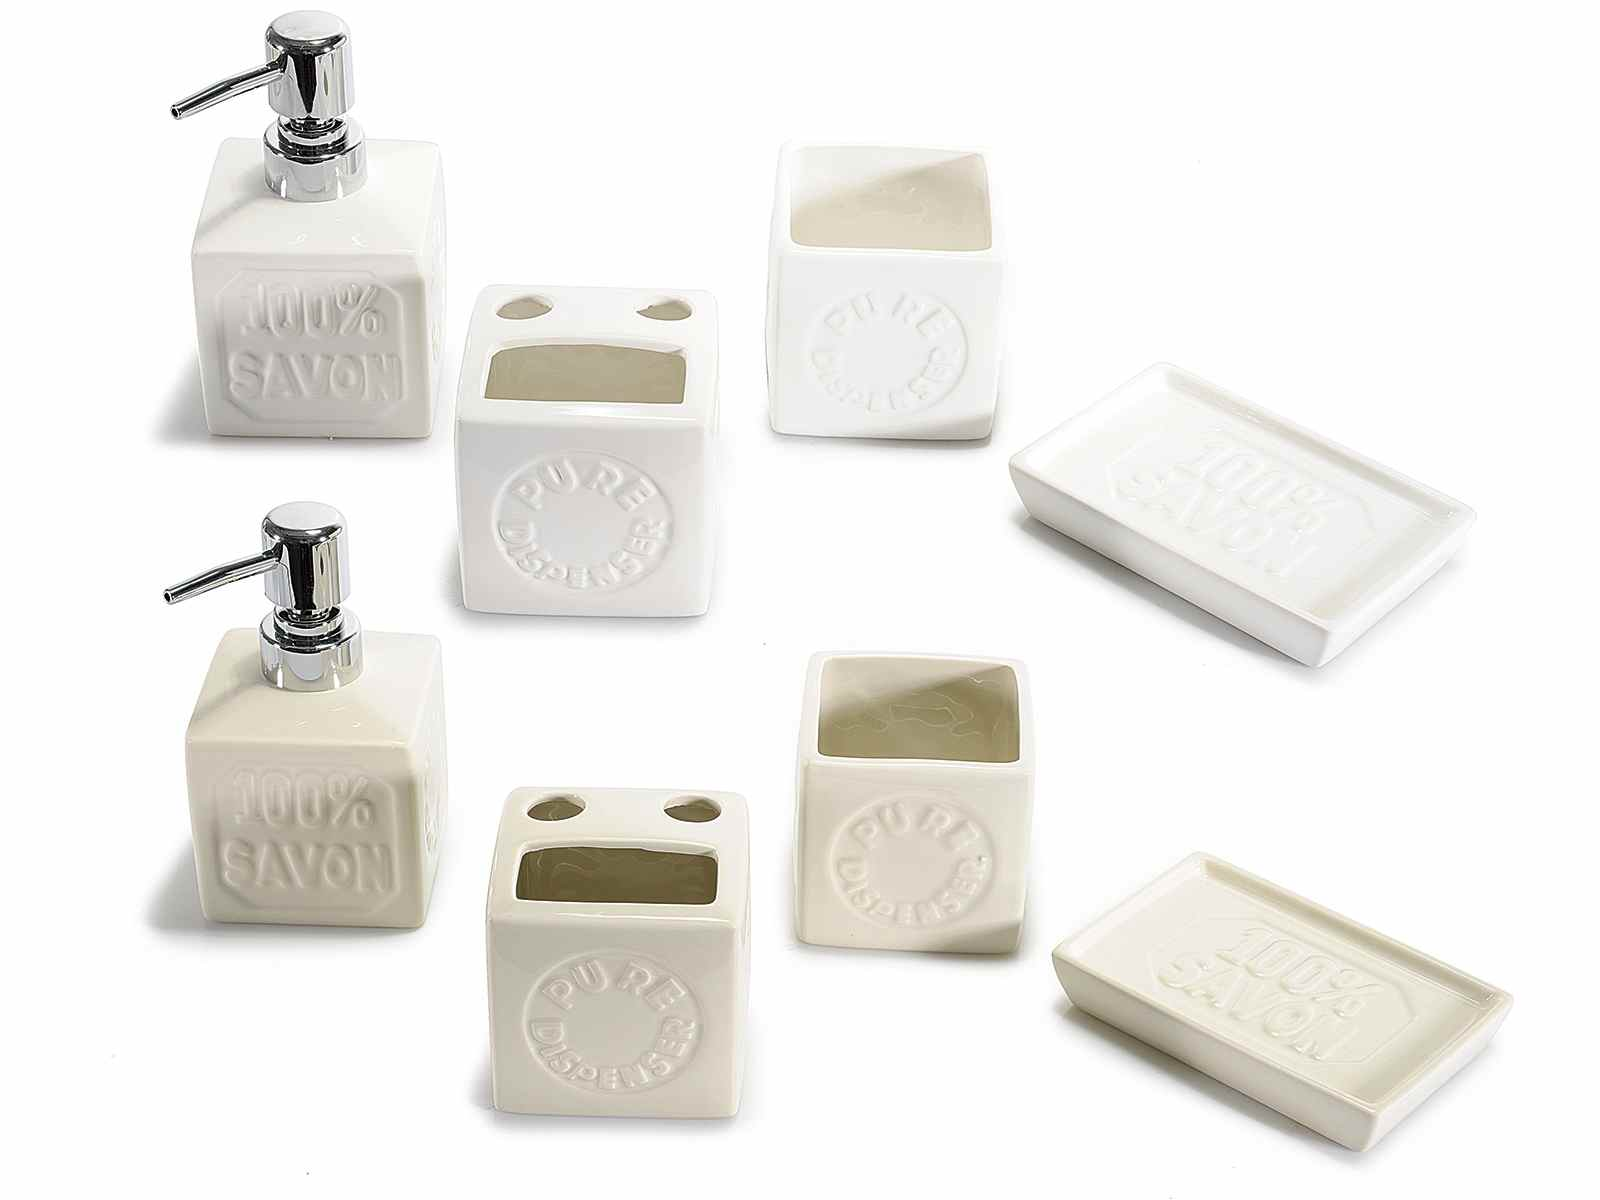 Set accessori da bagno in ceramica c decorazione a sapone